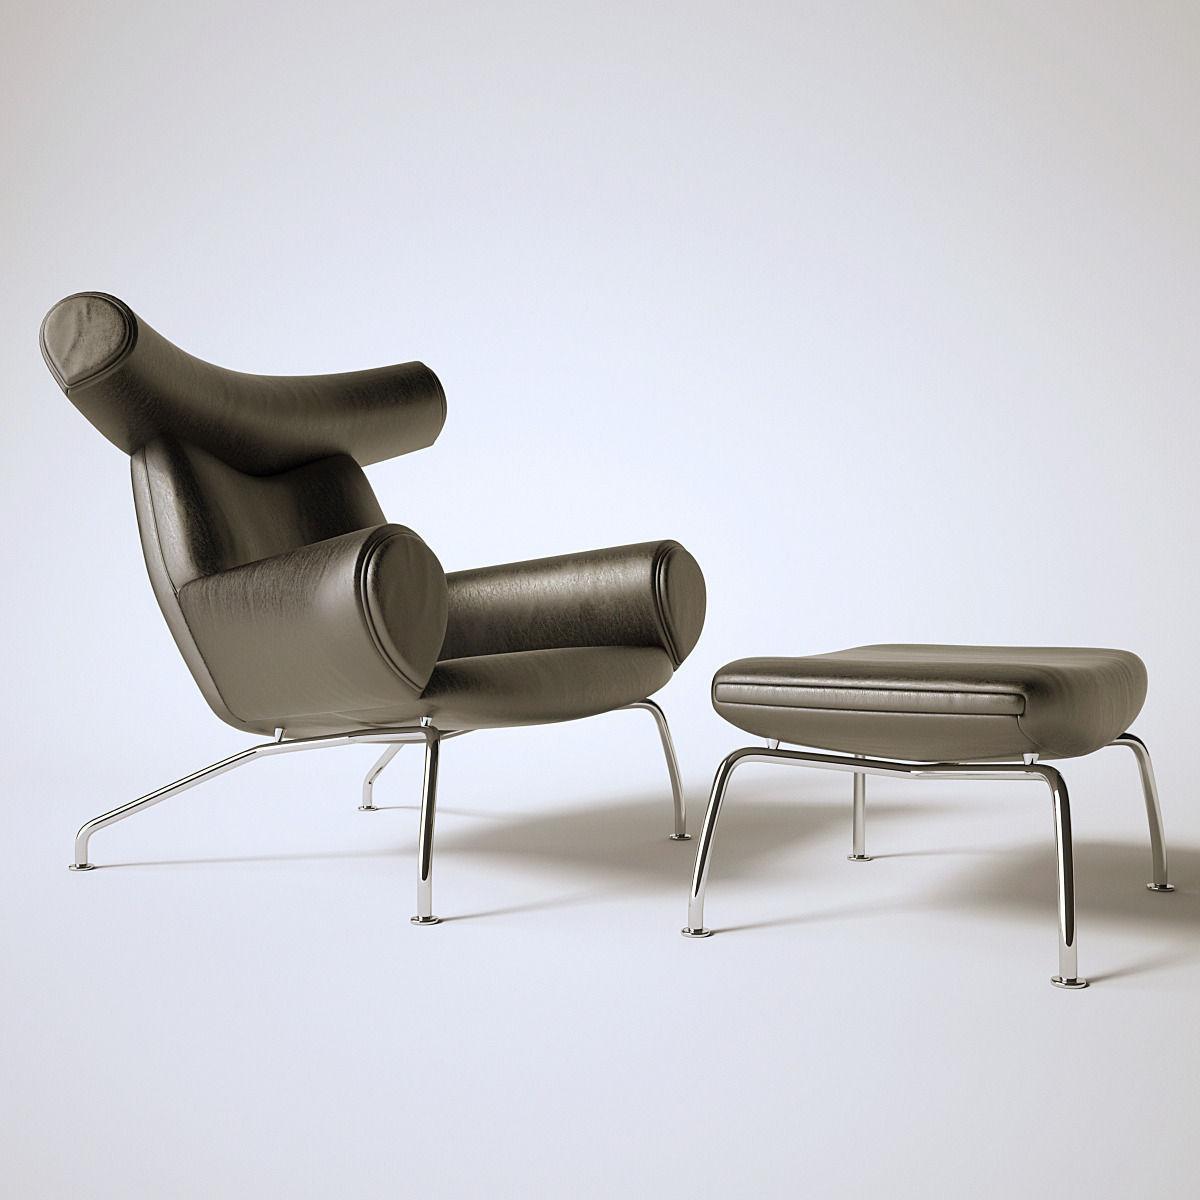 ... Ox Chair 3d Model Max Obj 3ds Fbx Mtl 4 ...